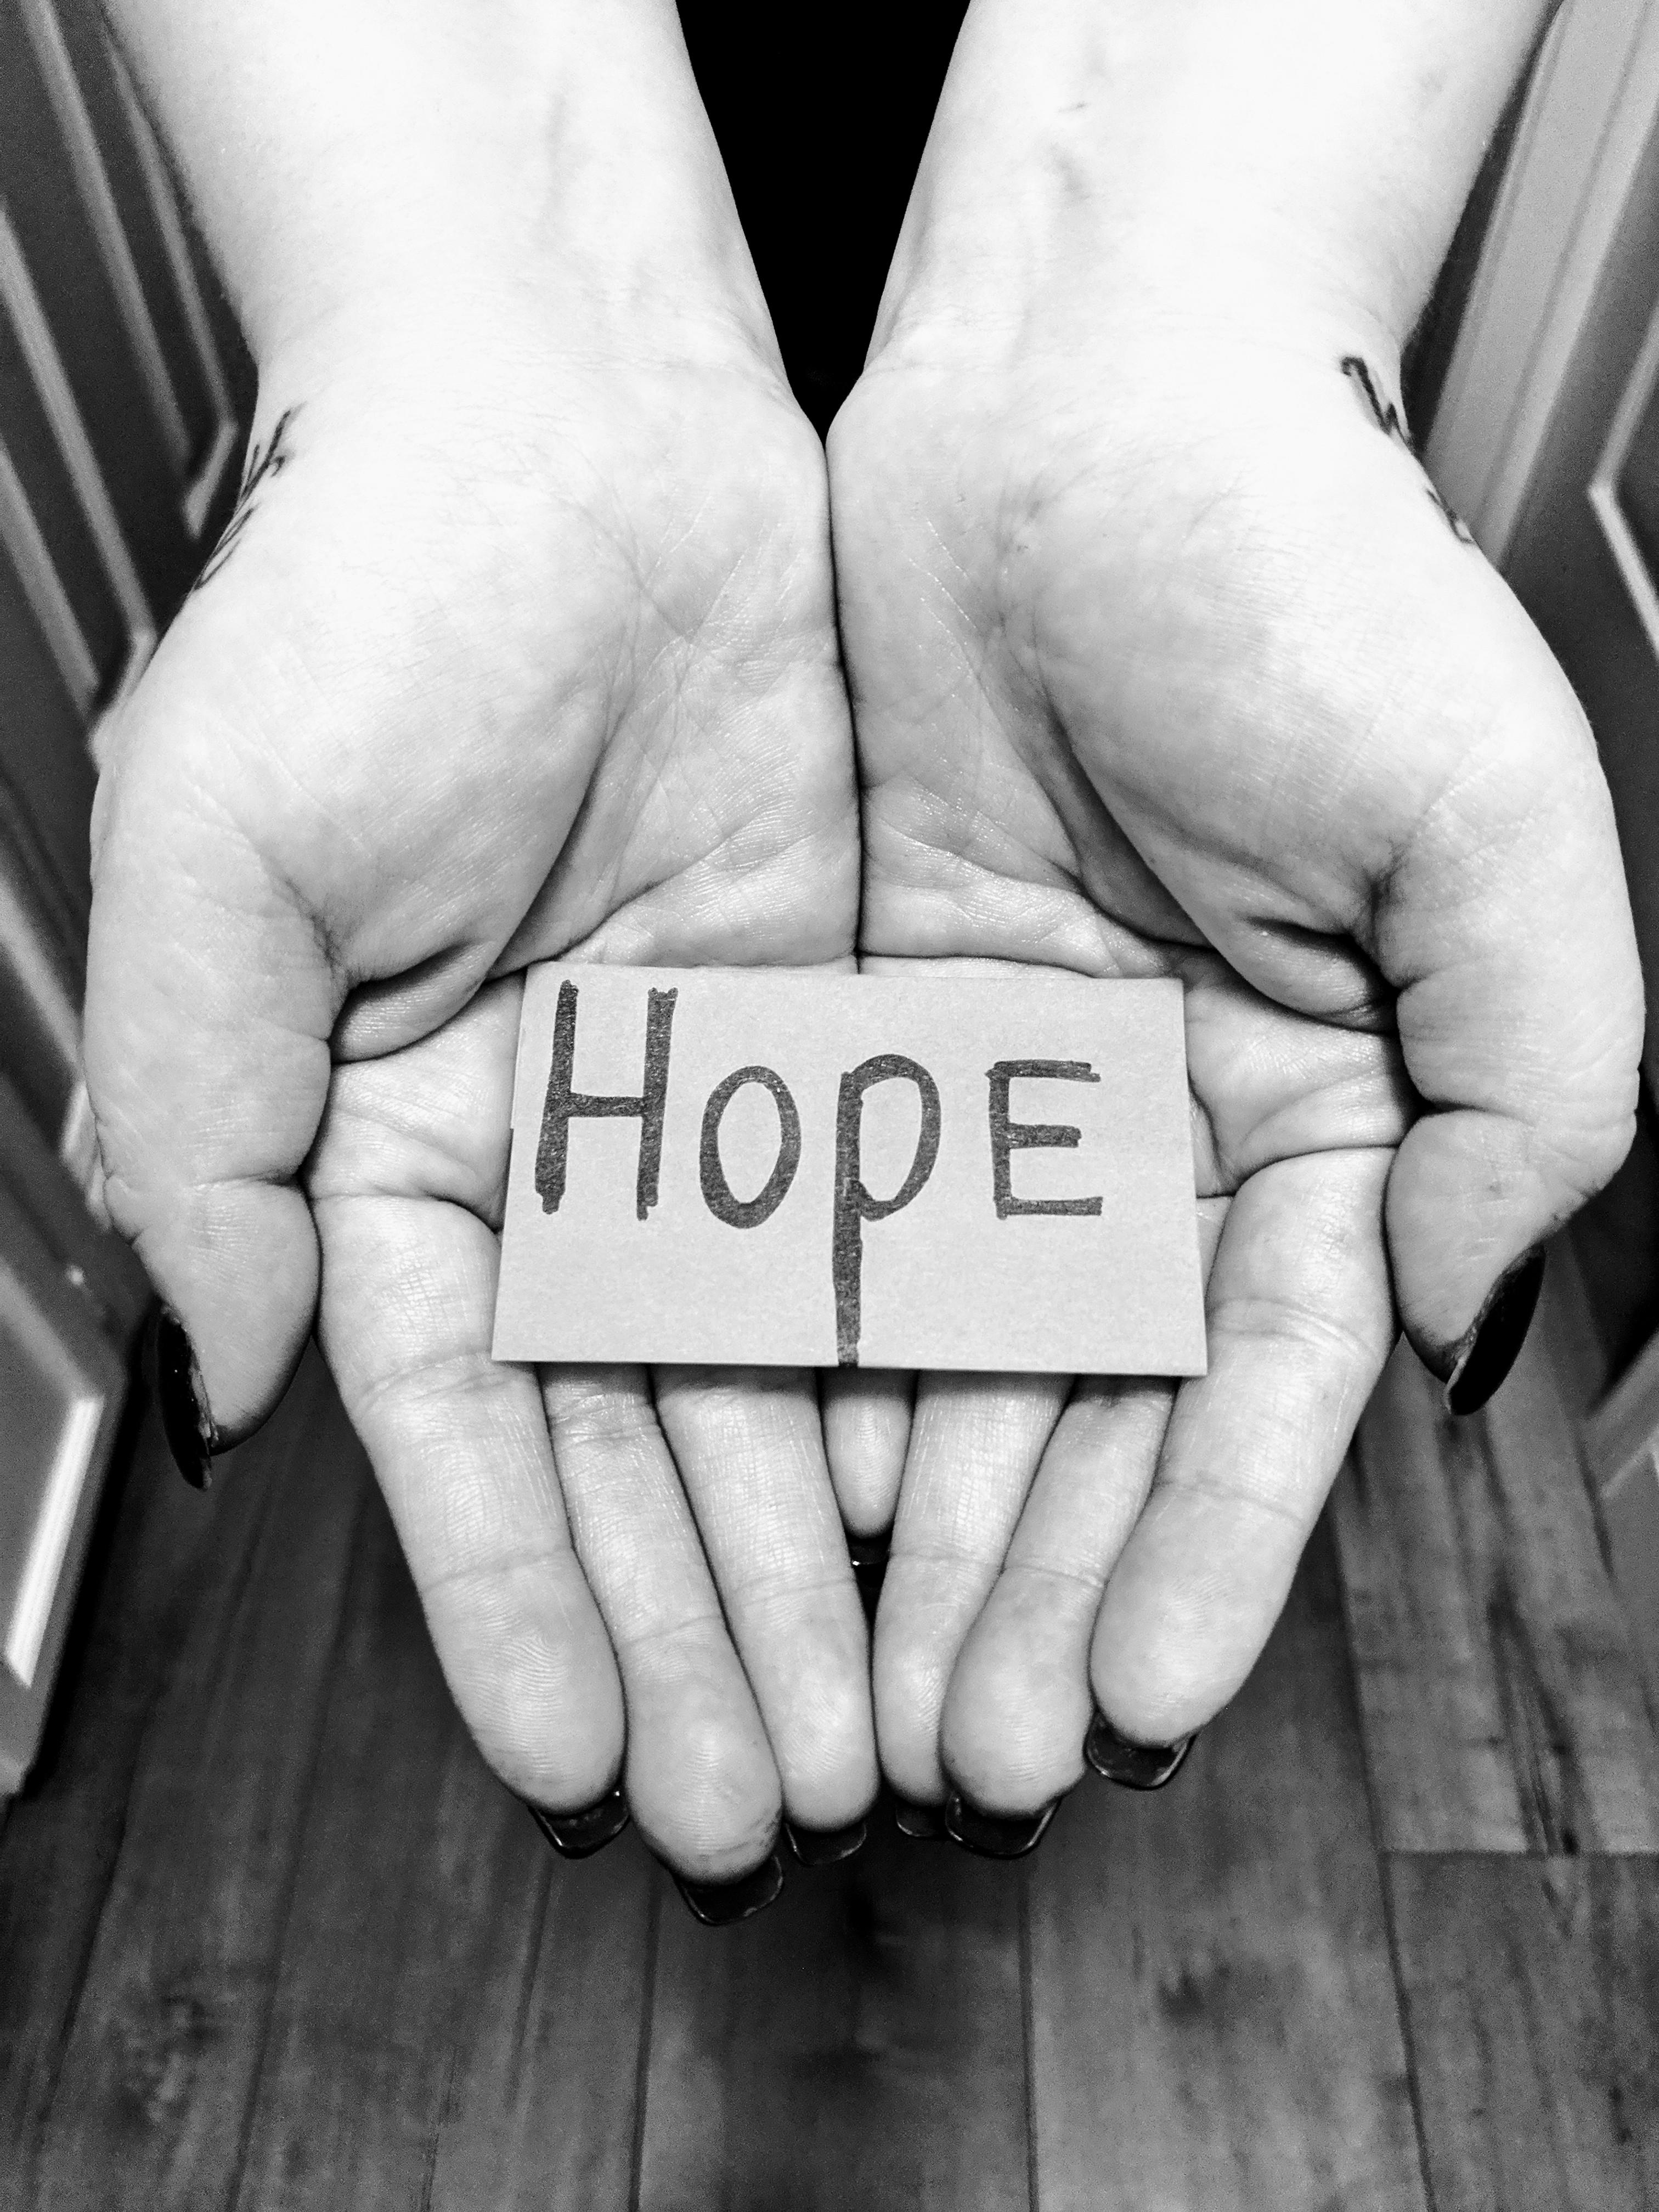 Ayuda social services program supporting survivors to rebuild their lives